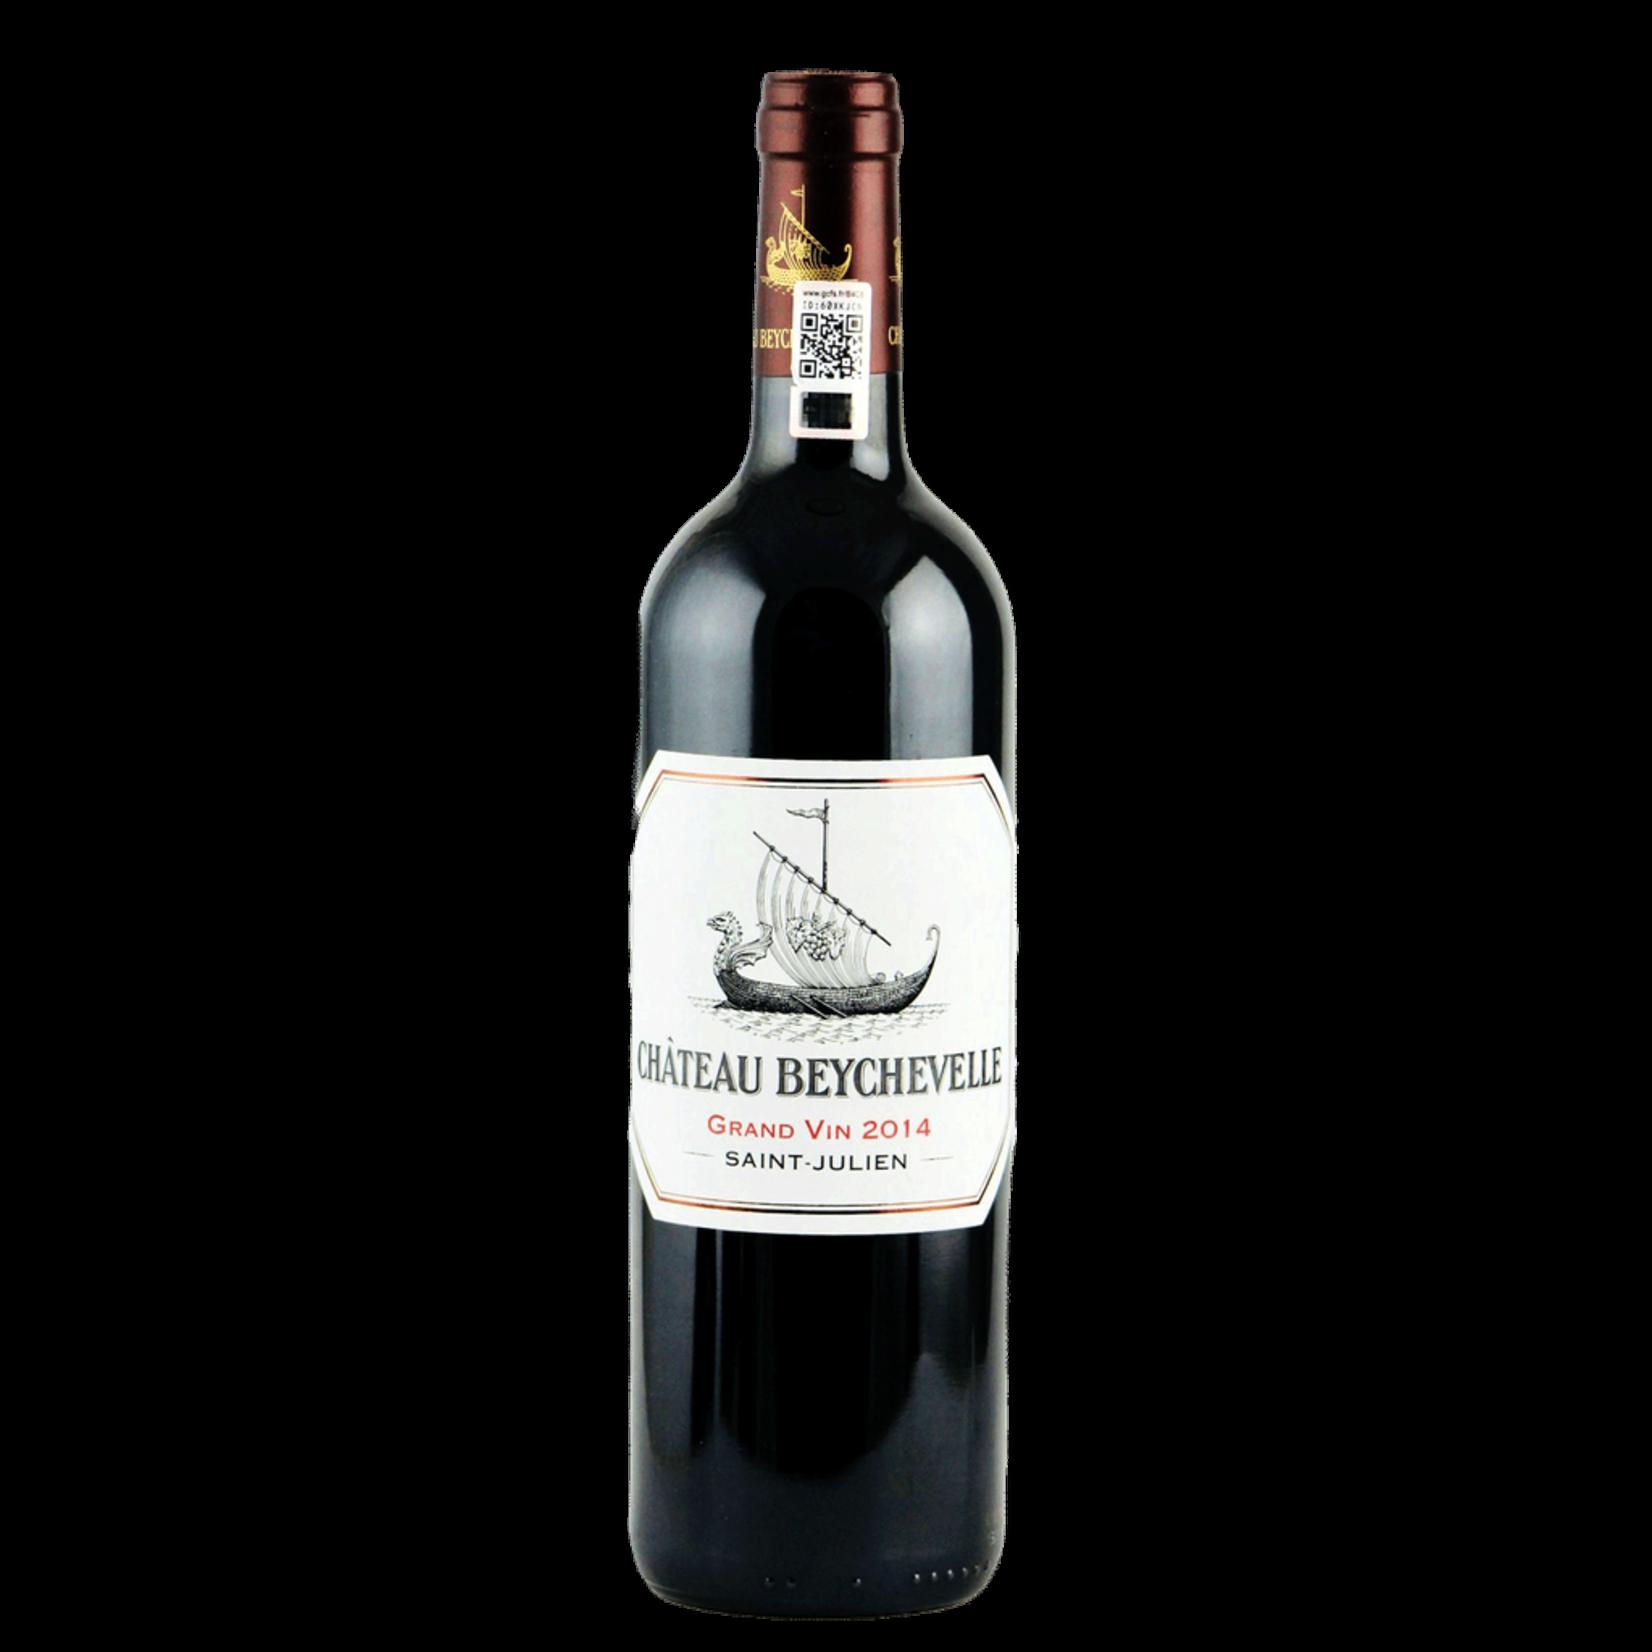 Wine Chateau Beychevelle Saint Julien 2014